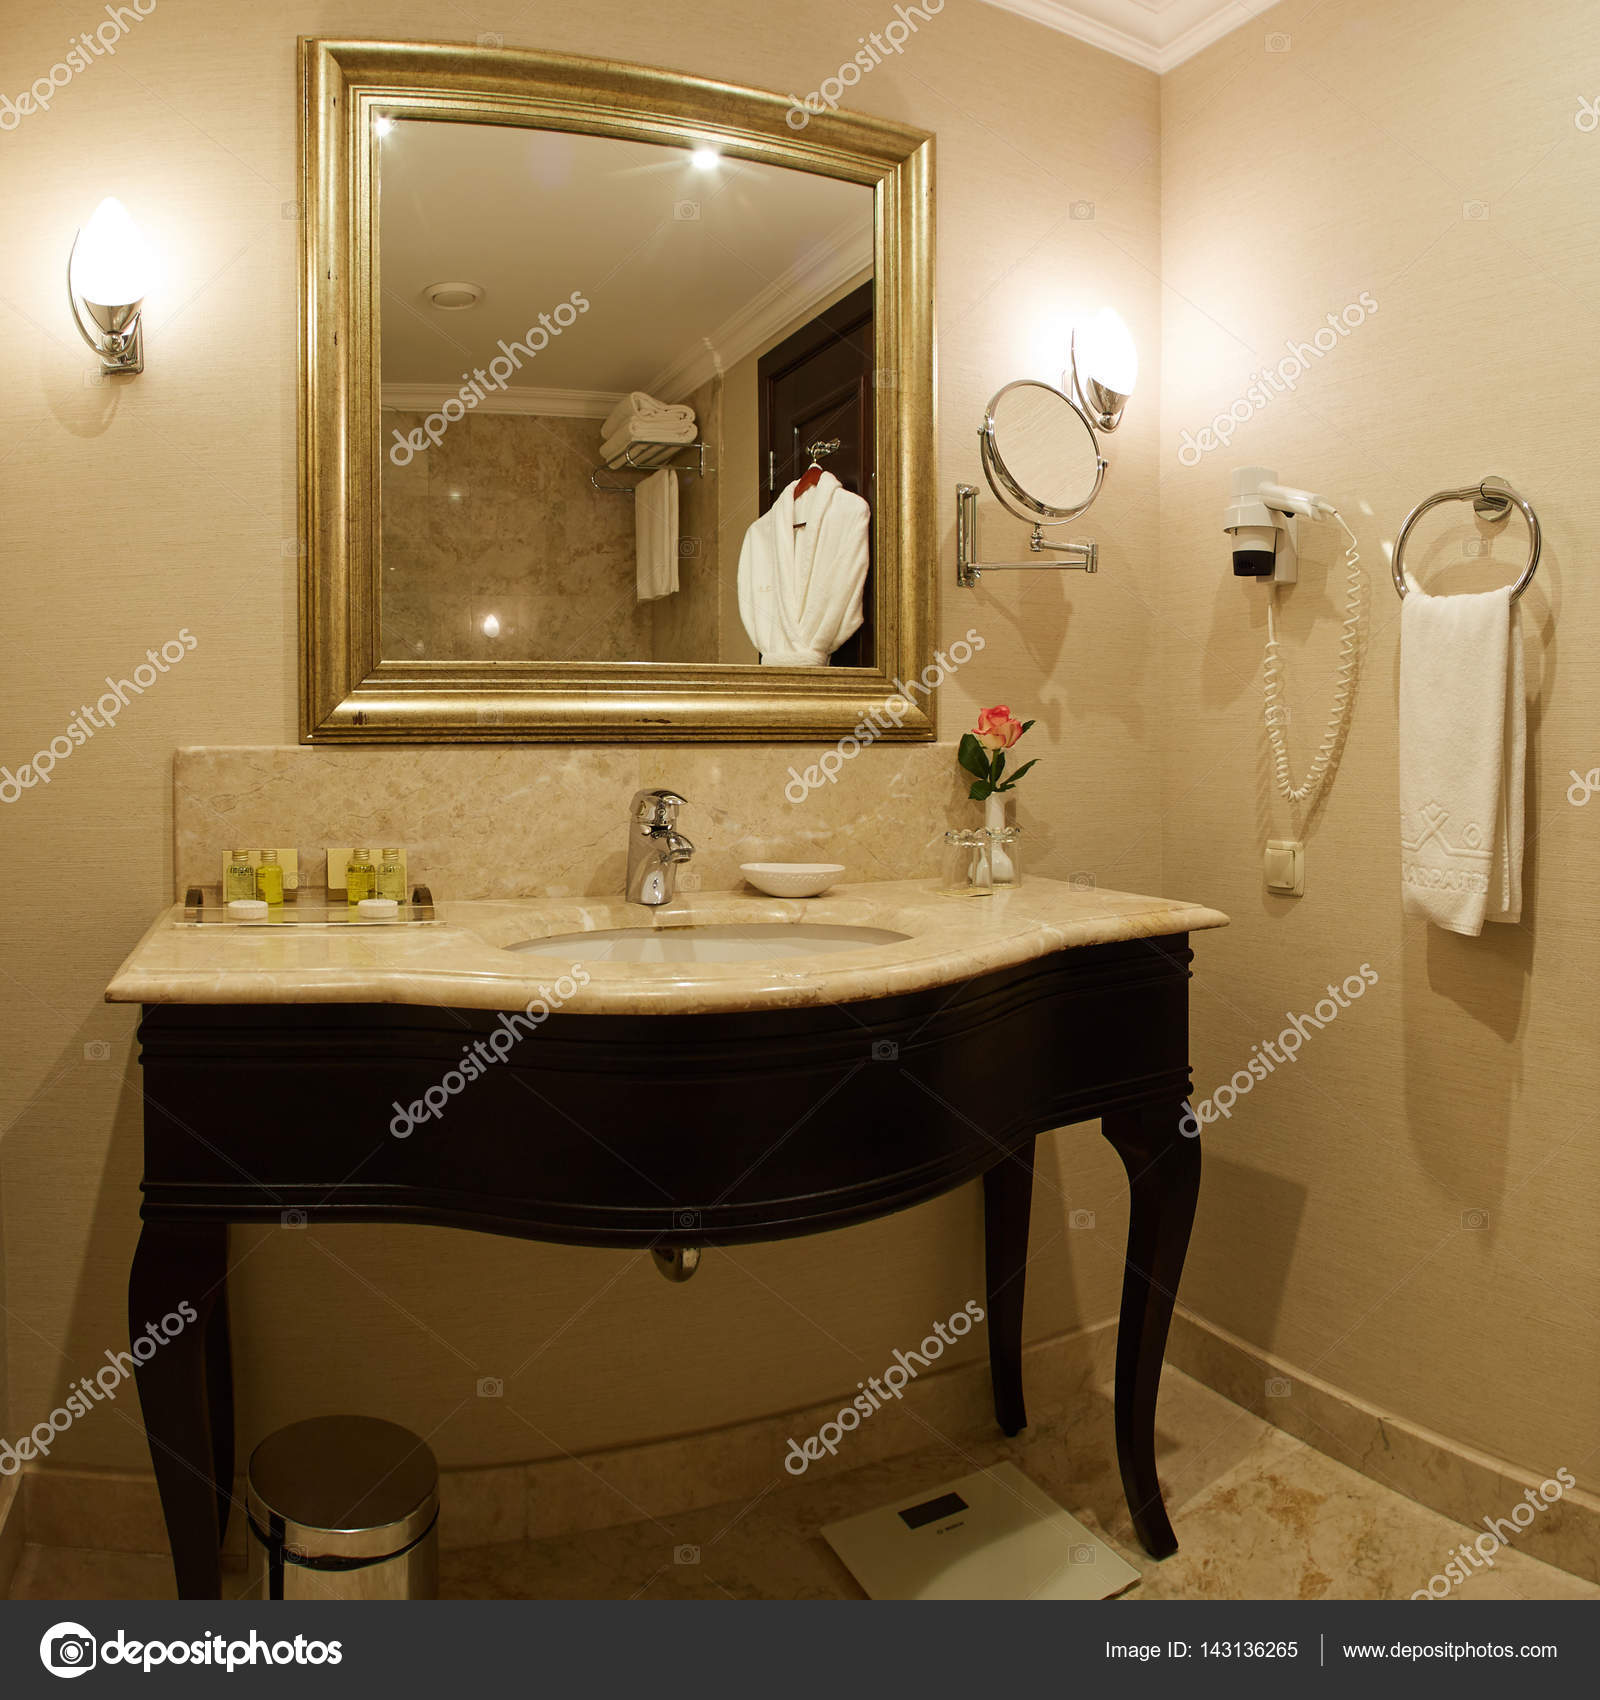 interieur van een hotel badkamer — Stockfoto © sarymsakov #143136265